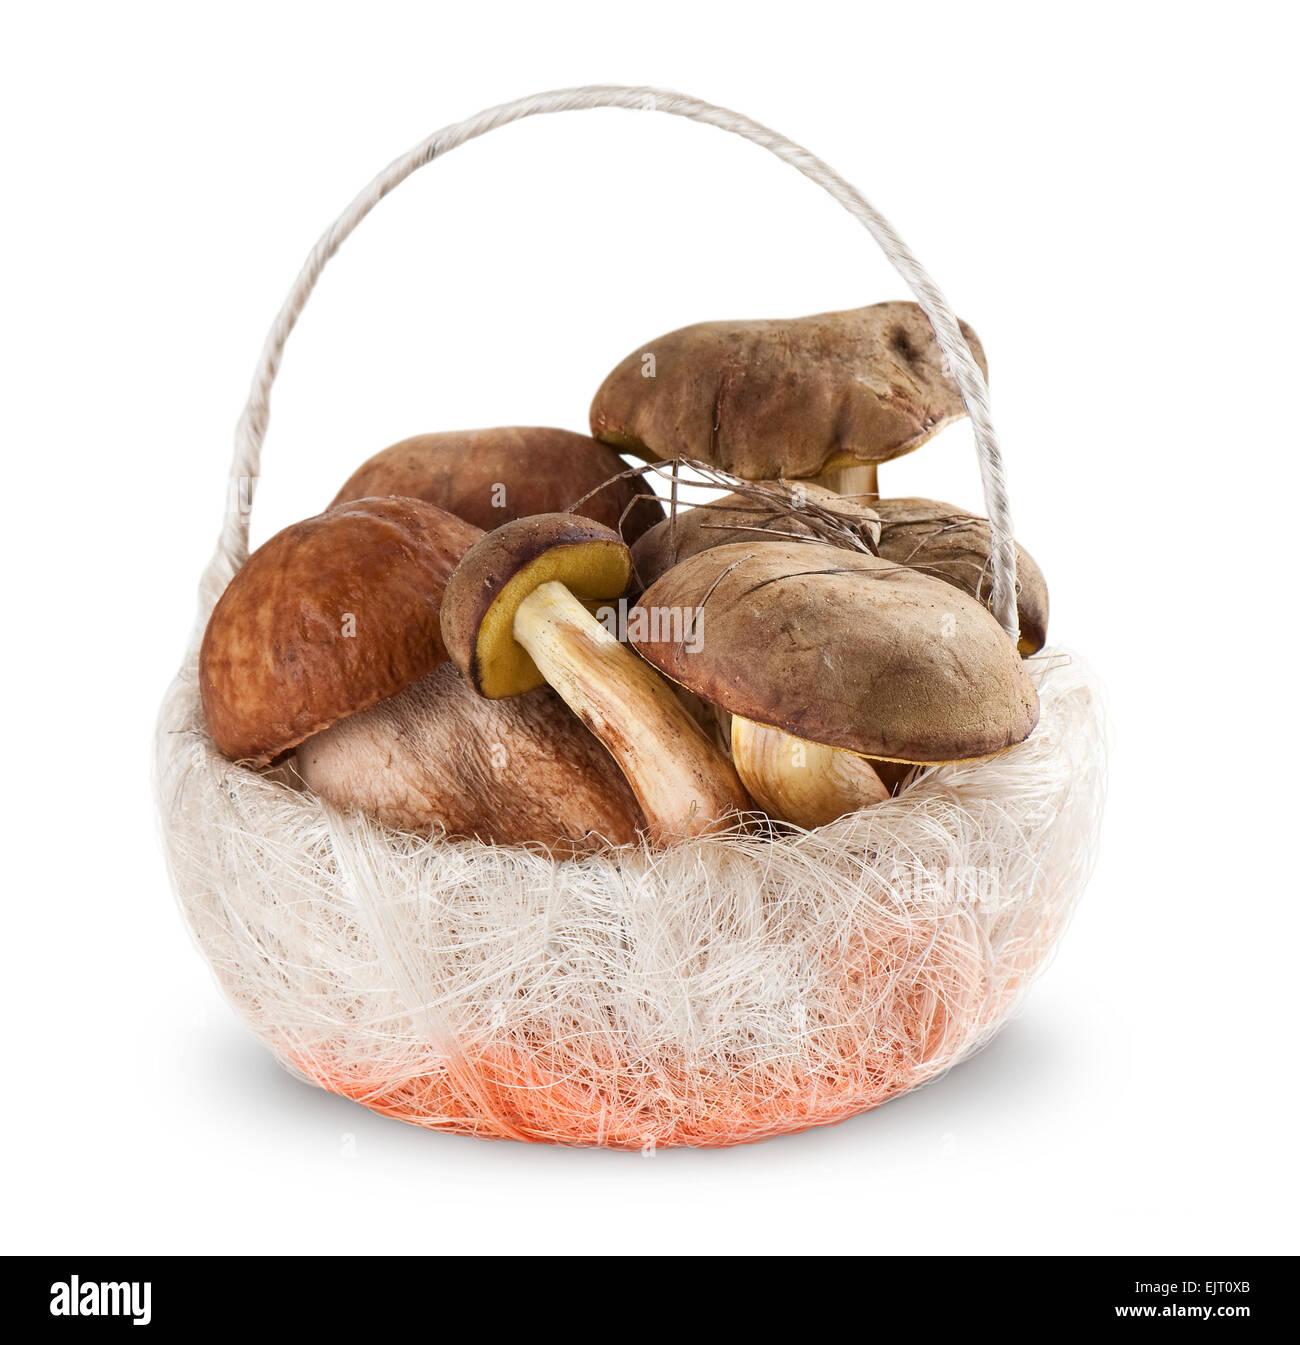 Boletus edulis and  White fungus in the basket  on white background - Stock Image